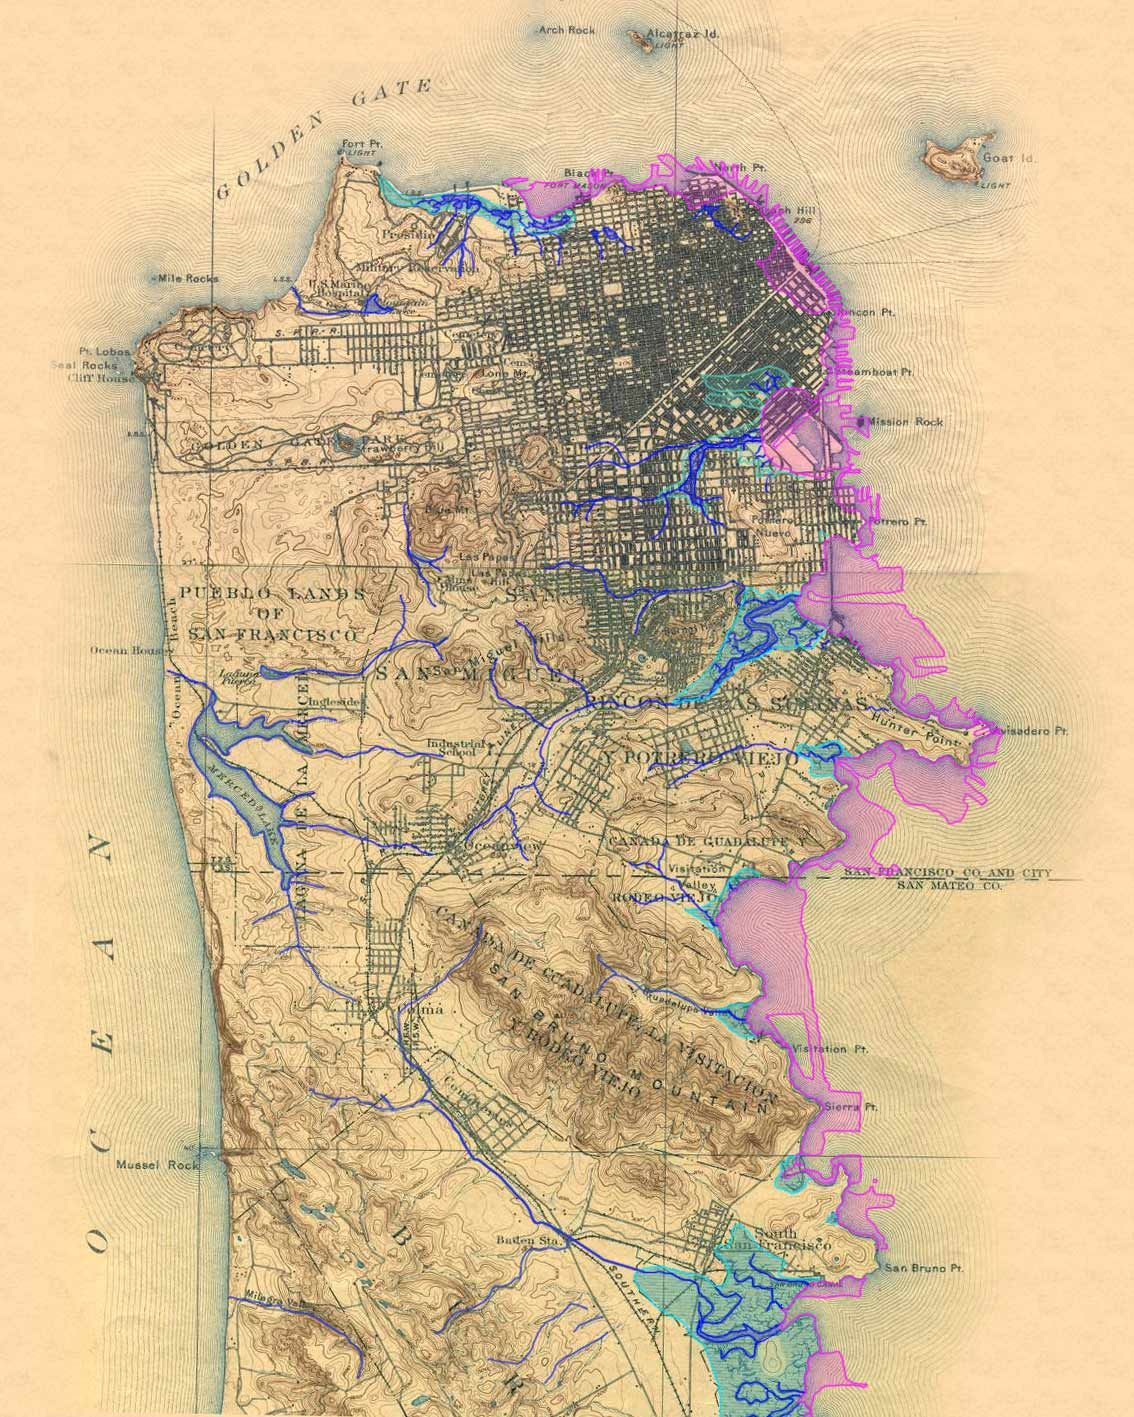 San Francisco Topographic Map | Ciudades | Pinterest | Topographic ...